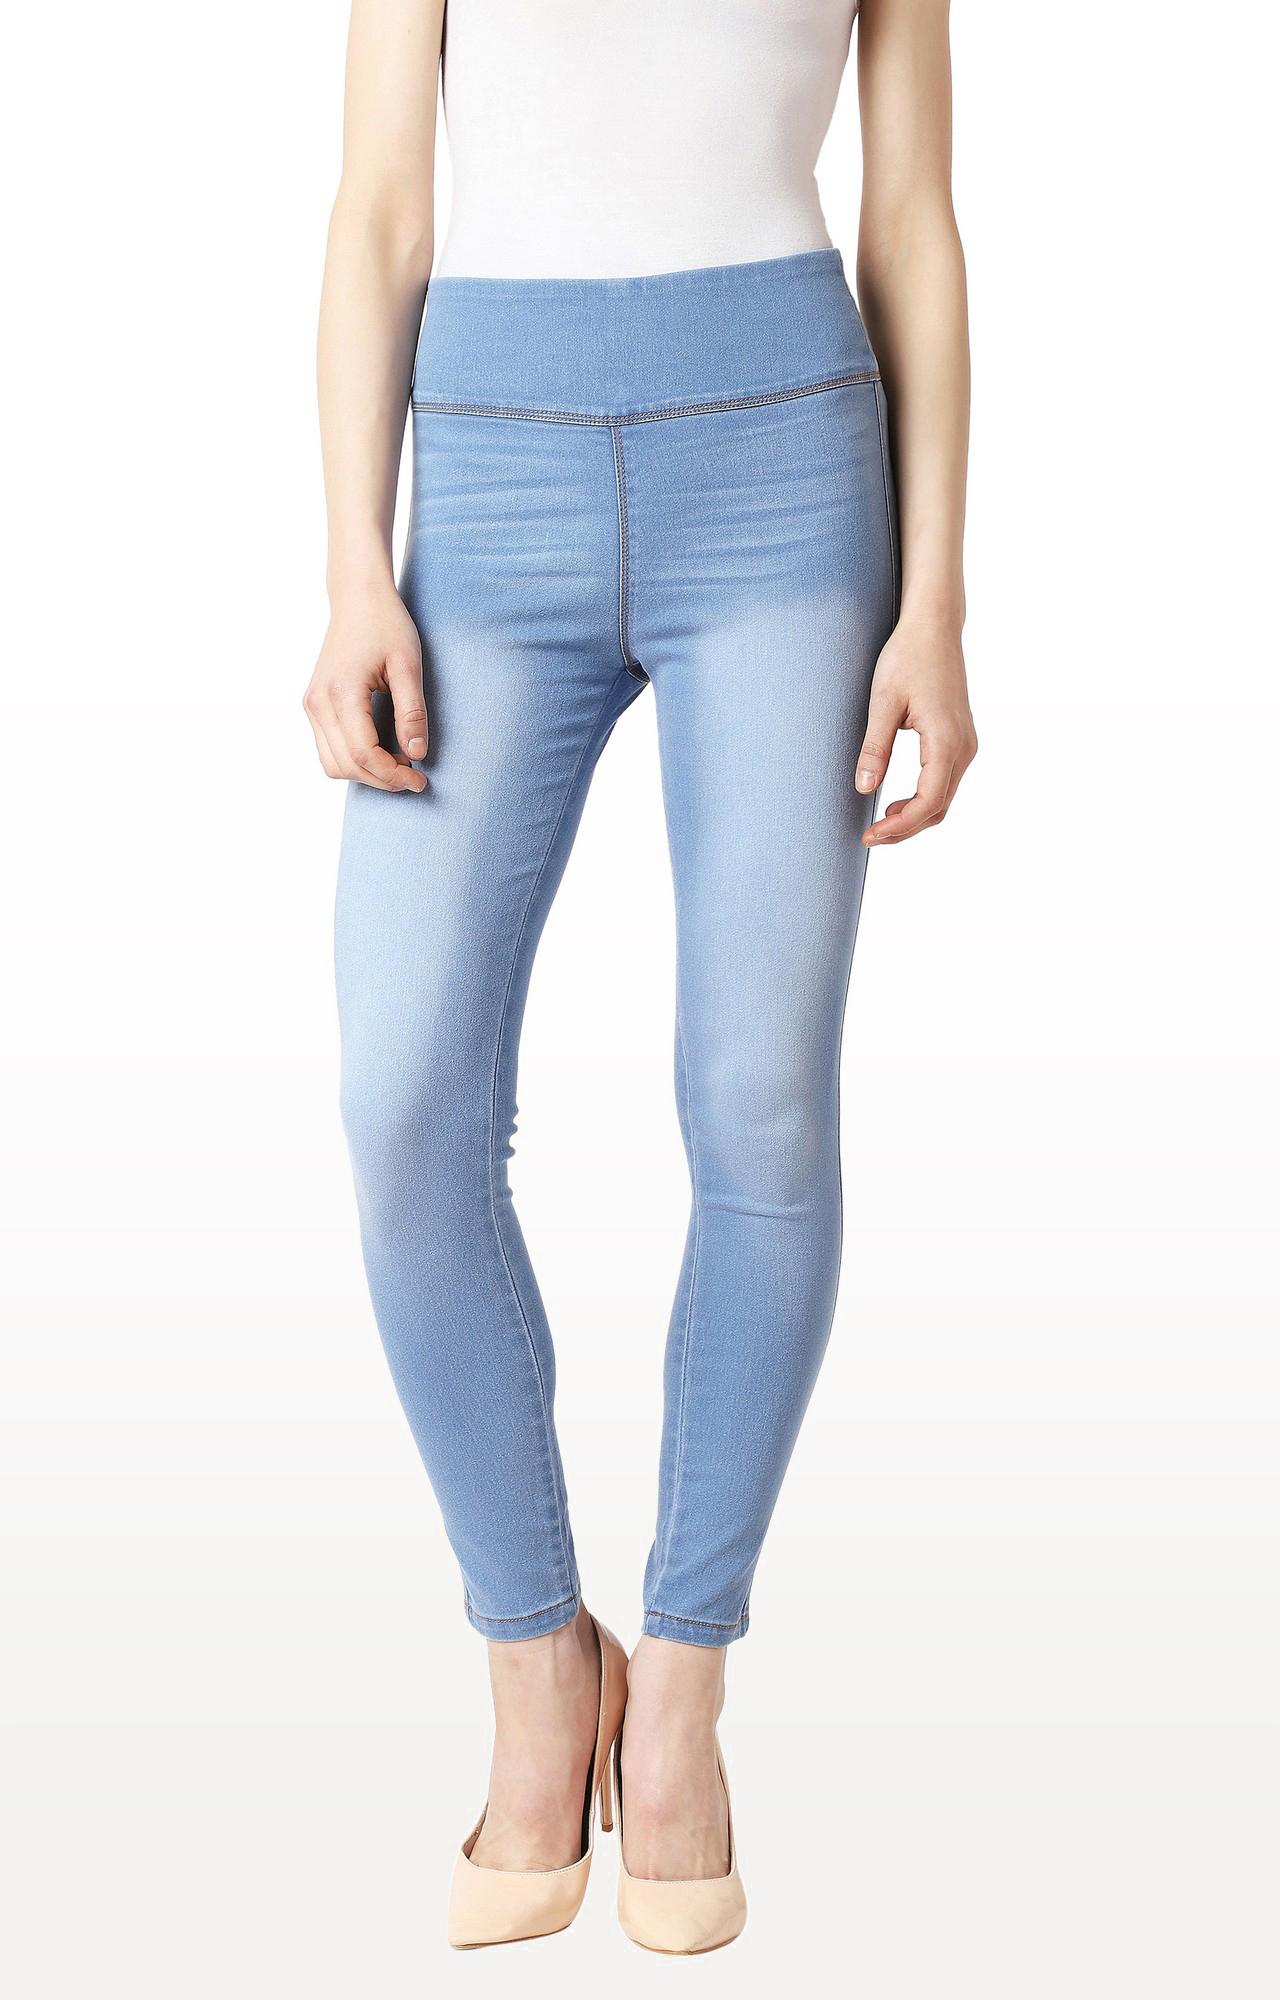 Light Blue Solid High Rise Clean Look Regular Length Denim Jeggings